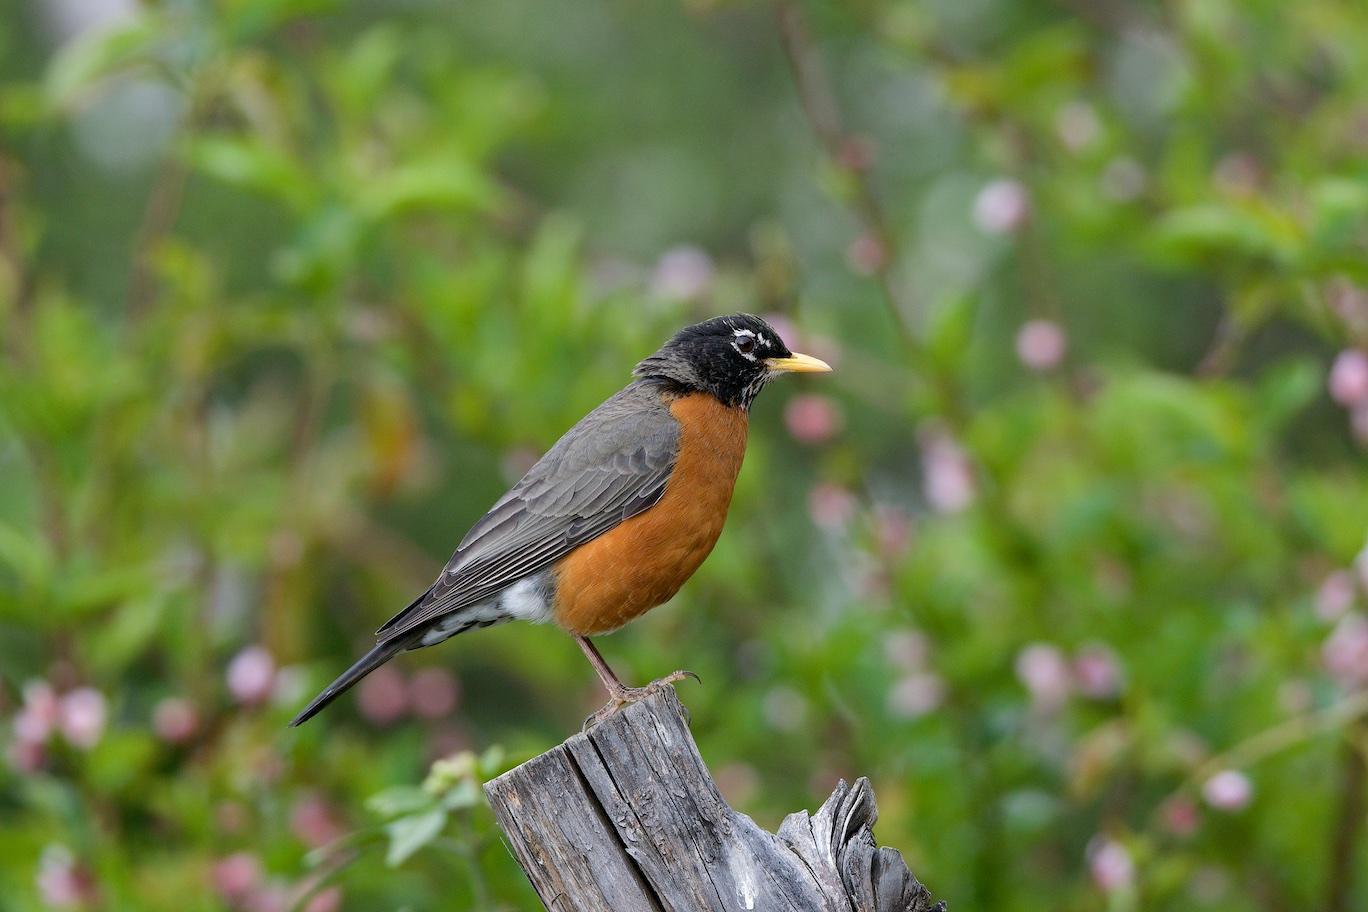 American Robin Photo by Gerald Hoekstra